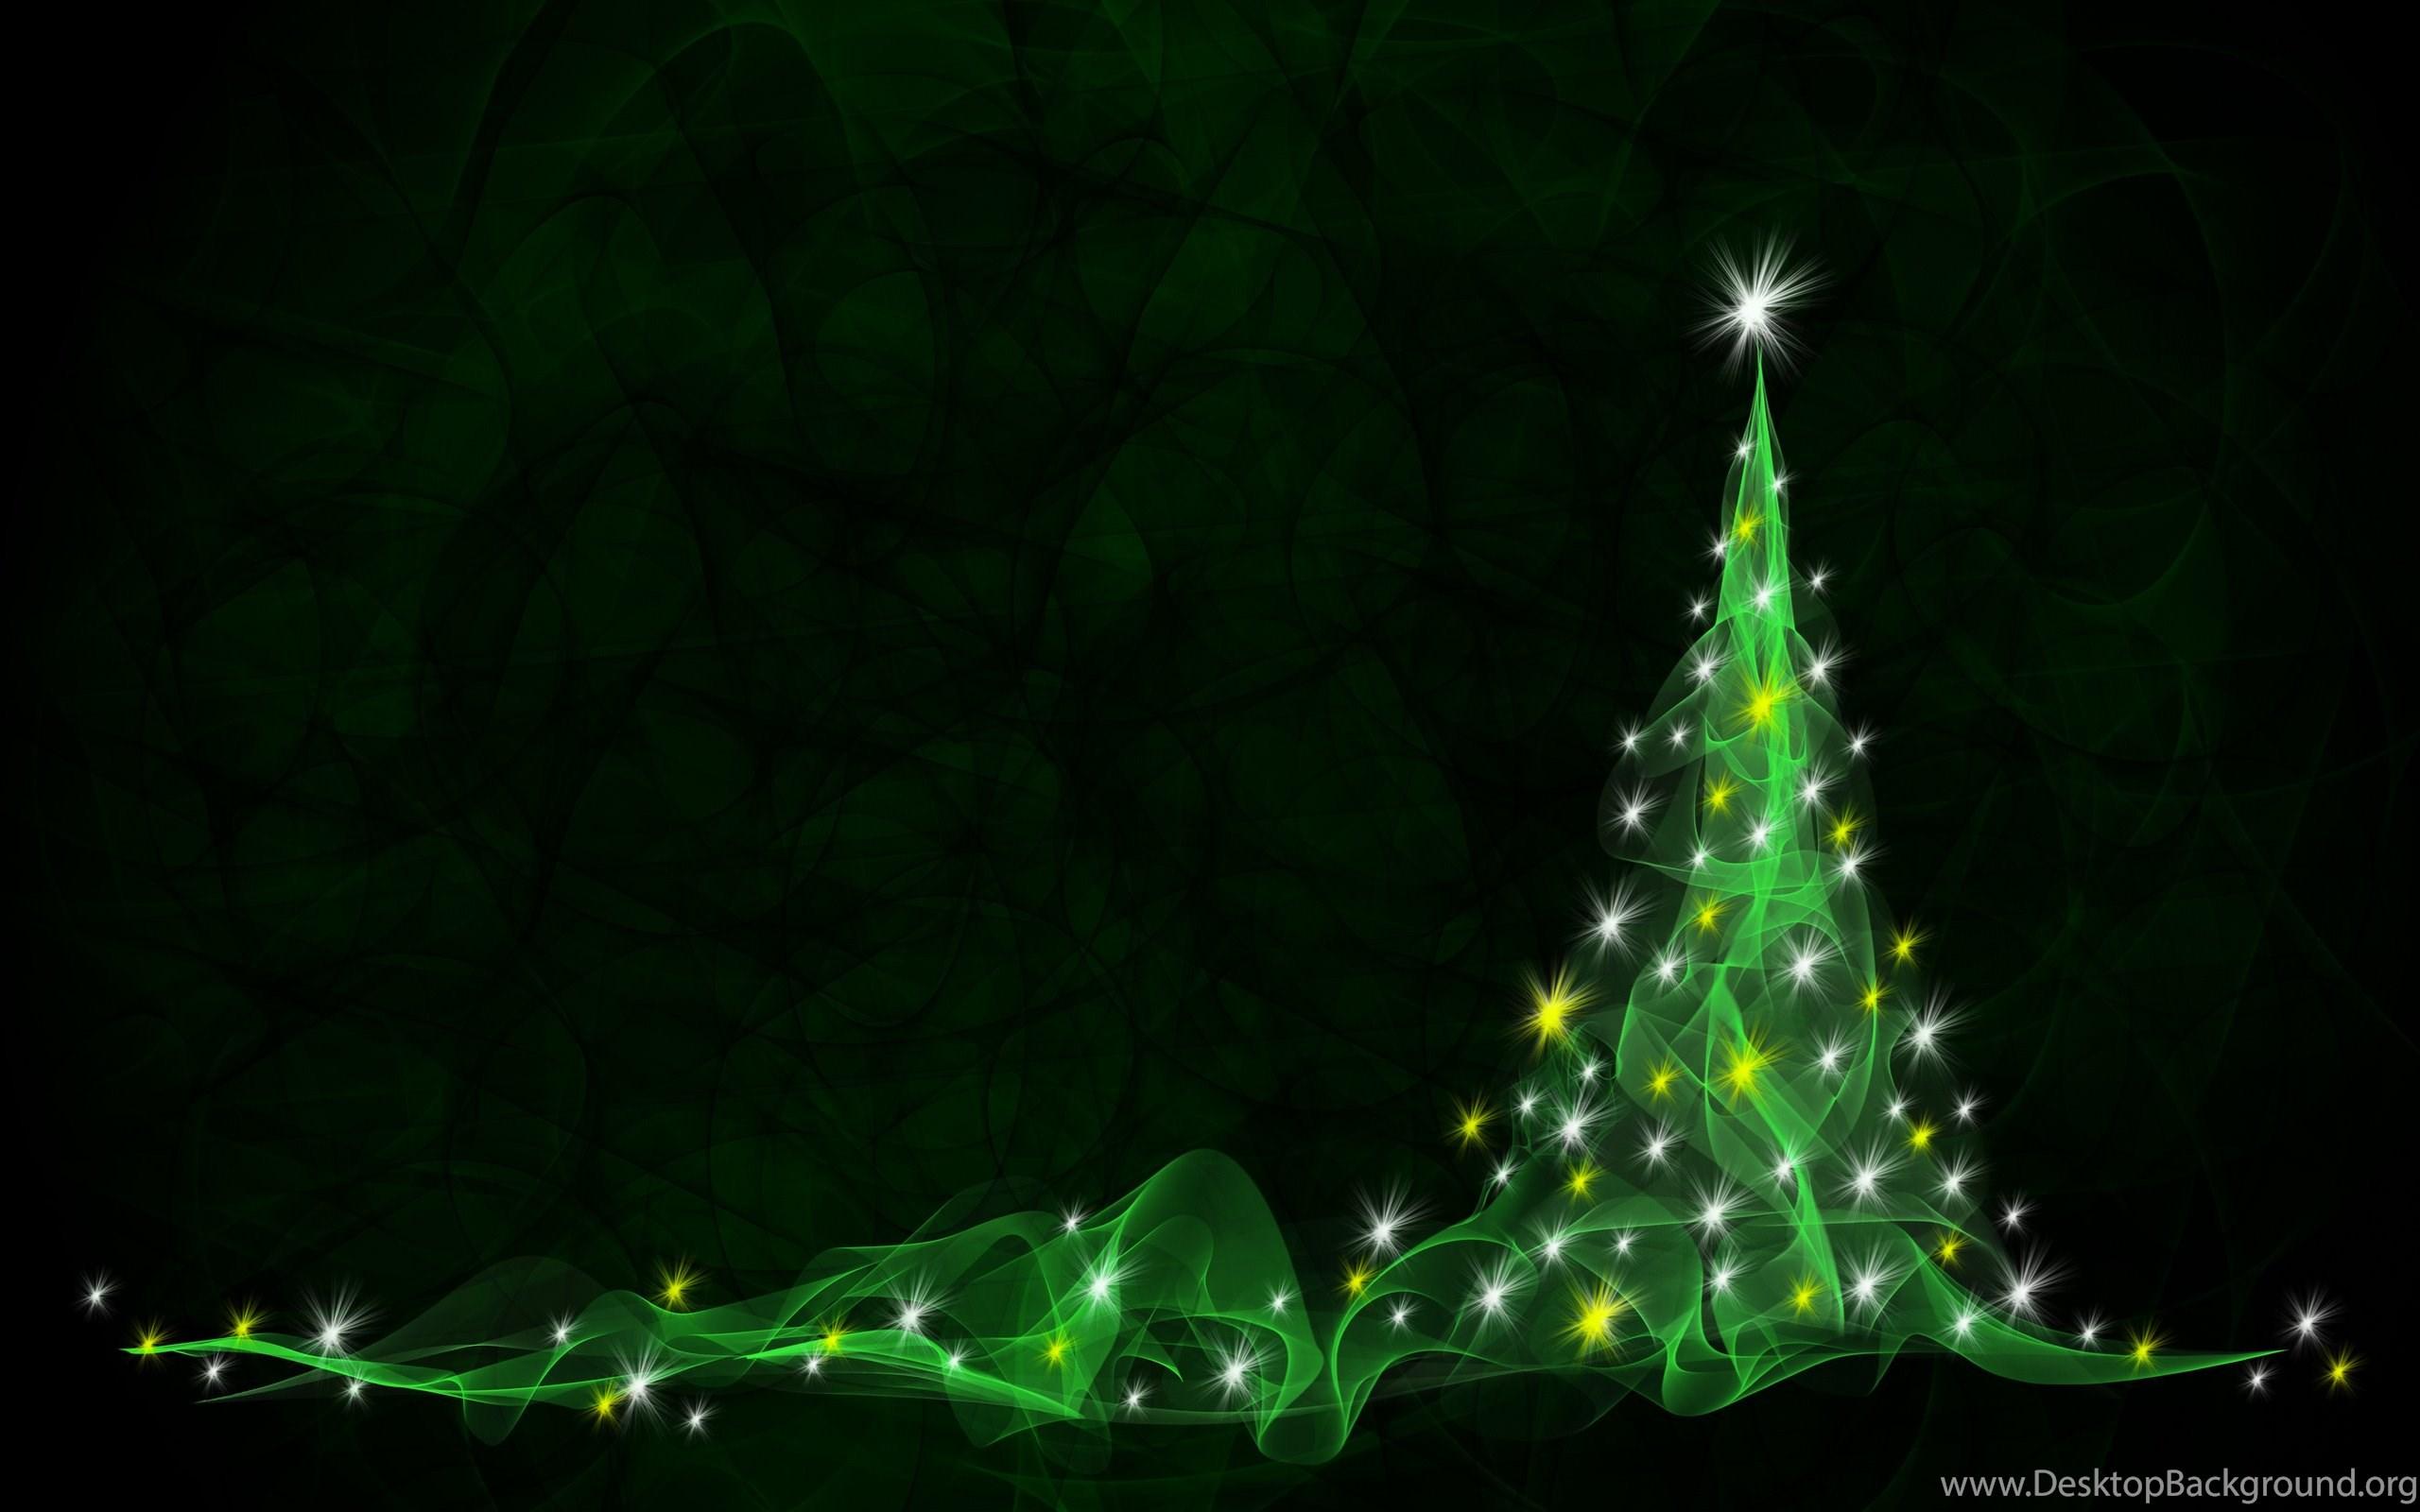 Green Christmas Tree Artwork Wallpapers Desktop Background